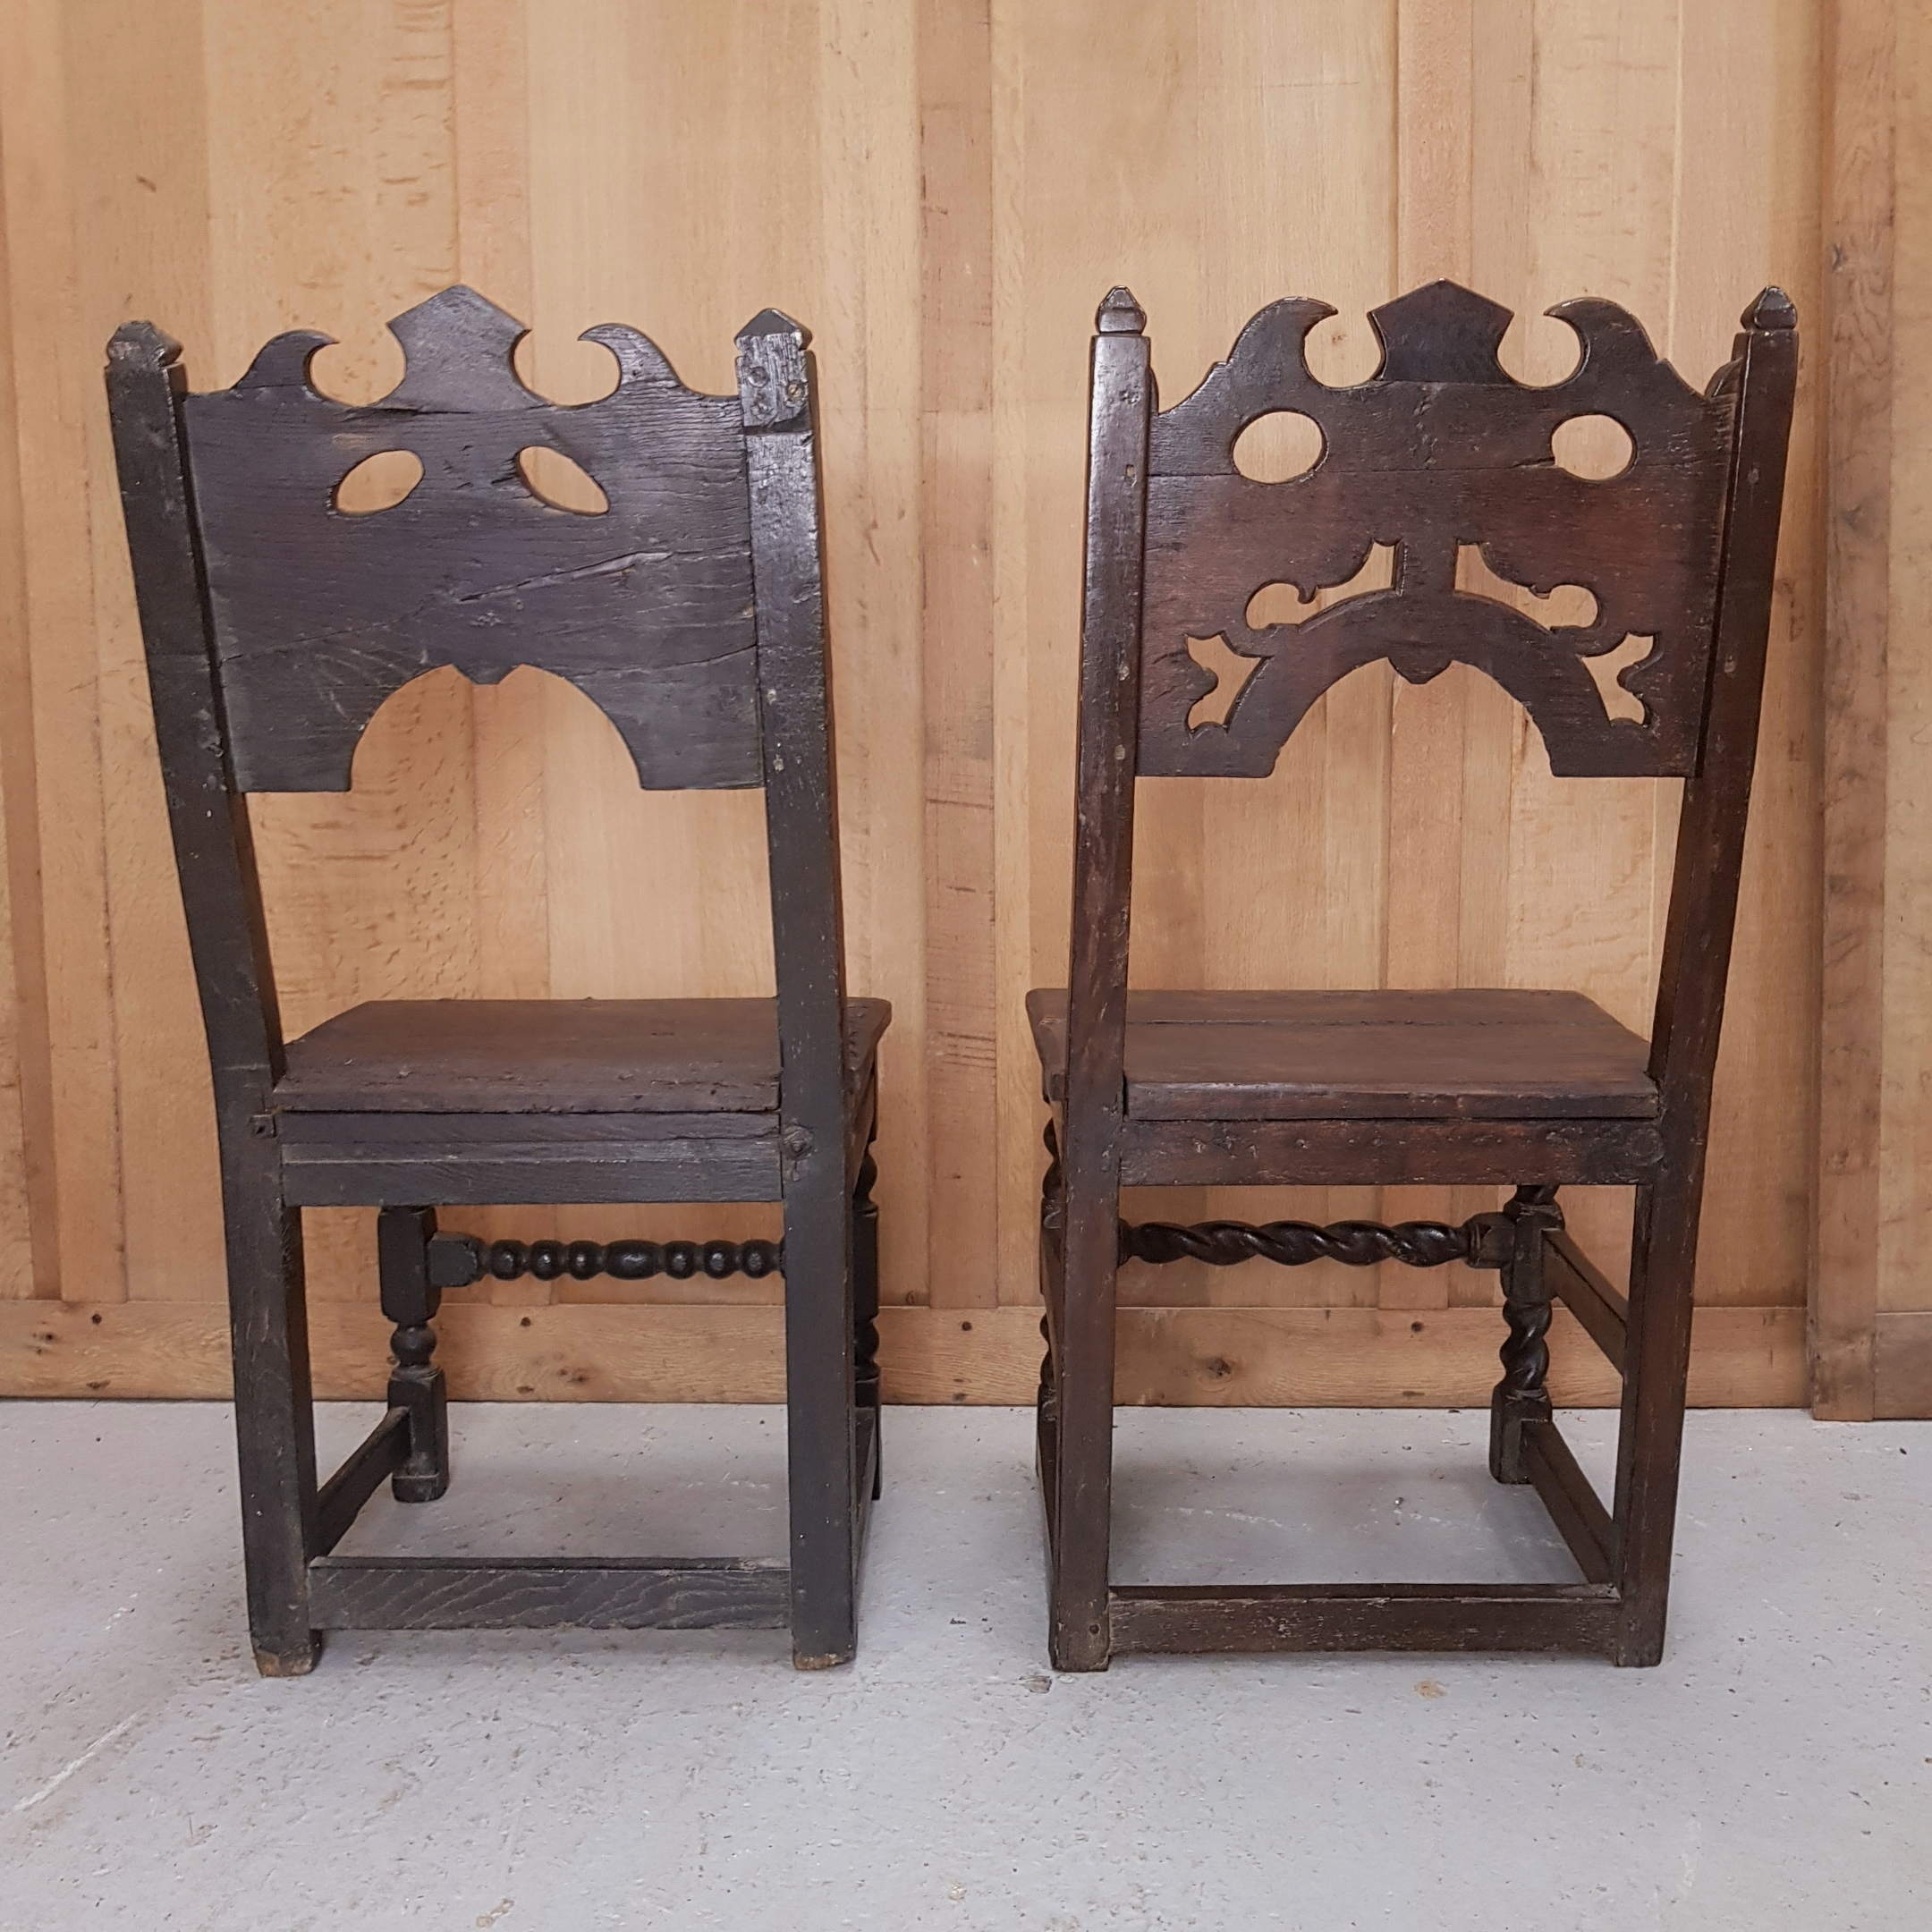 Ancient Oak Wainscot Chairs - Antique Church Antiques